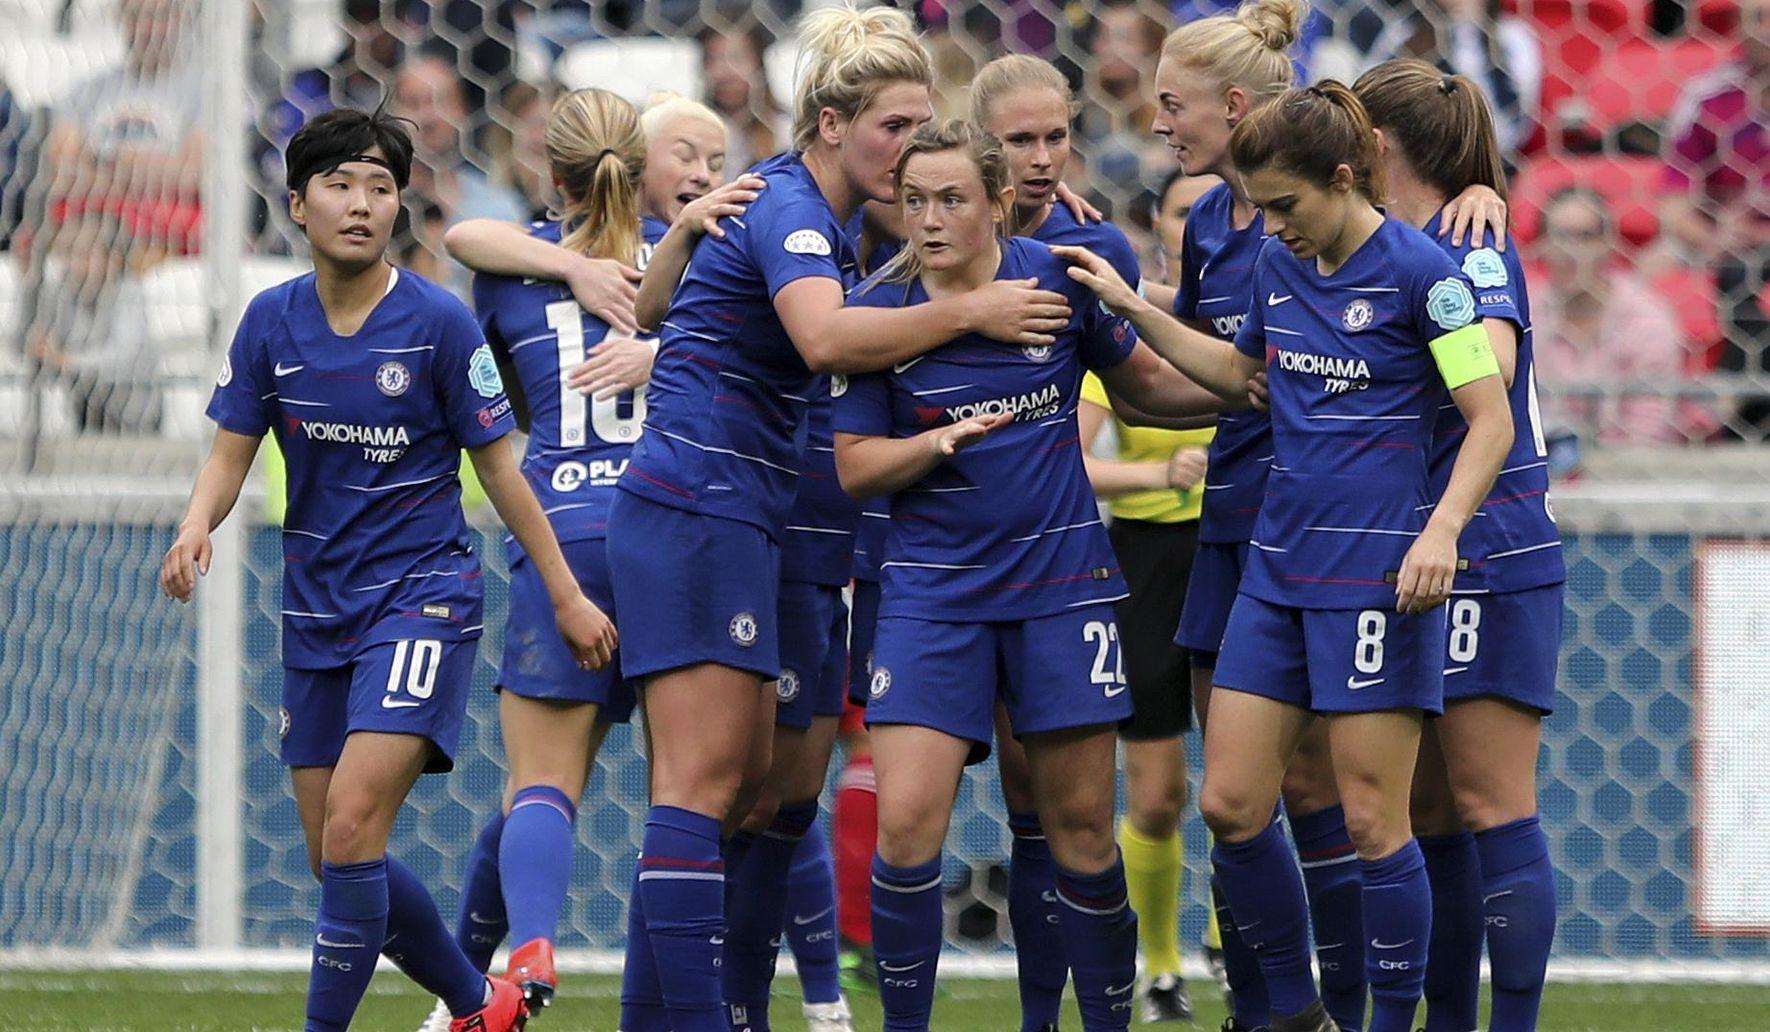 Soccer_chelsea_womens_champion_80473_c0-100-1845-1175_s1770x1032